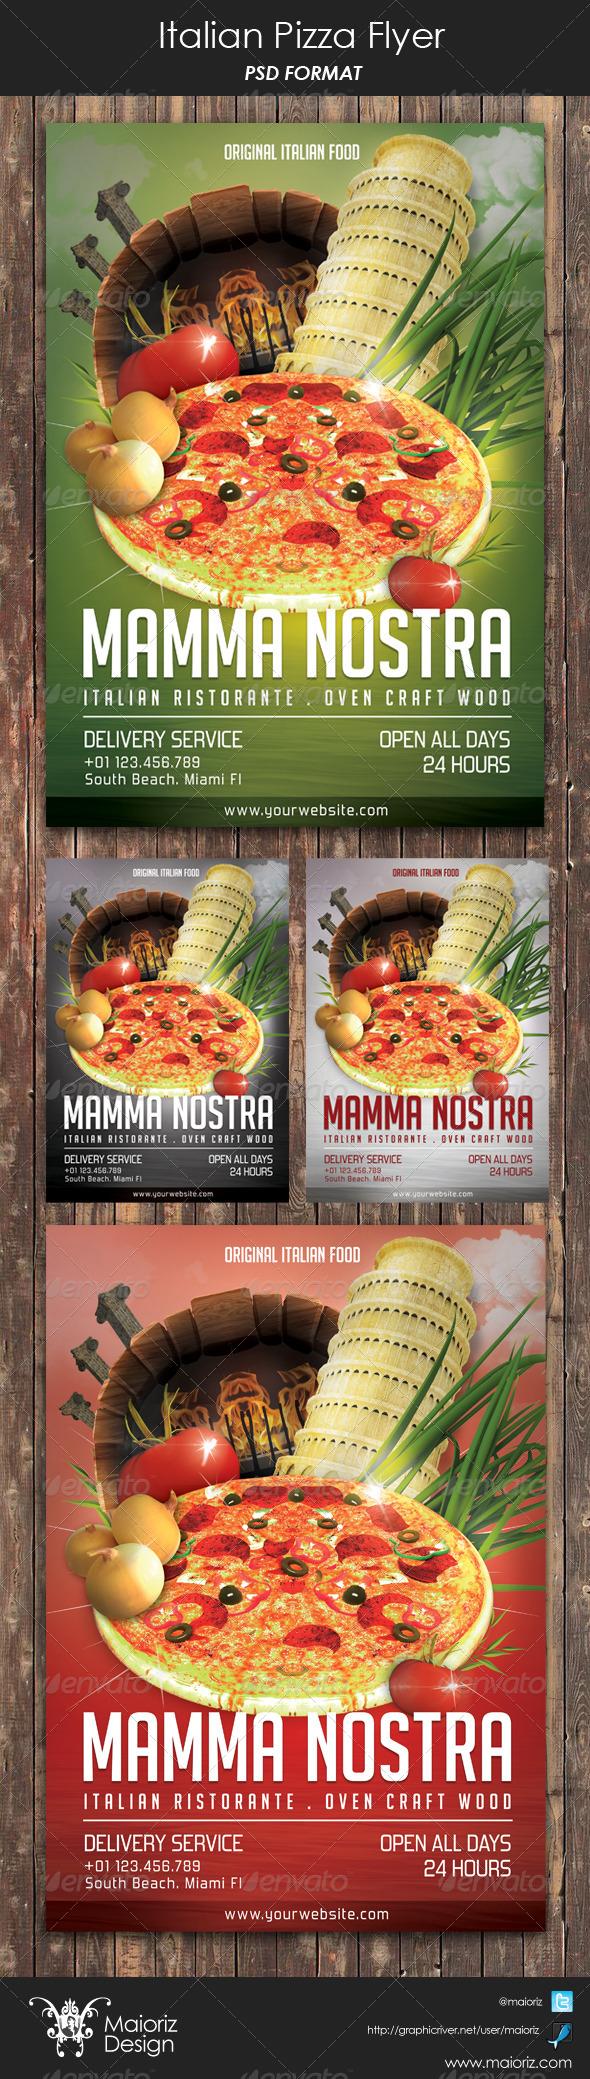 Italian Pizzeria Restaurant Flyer